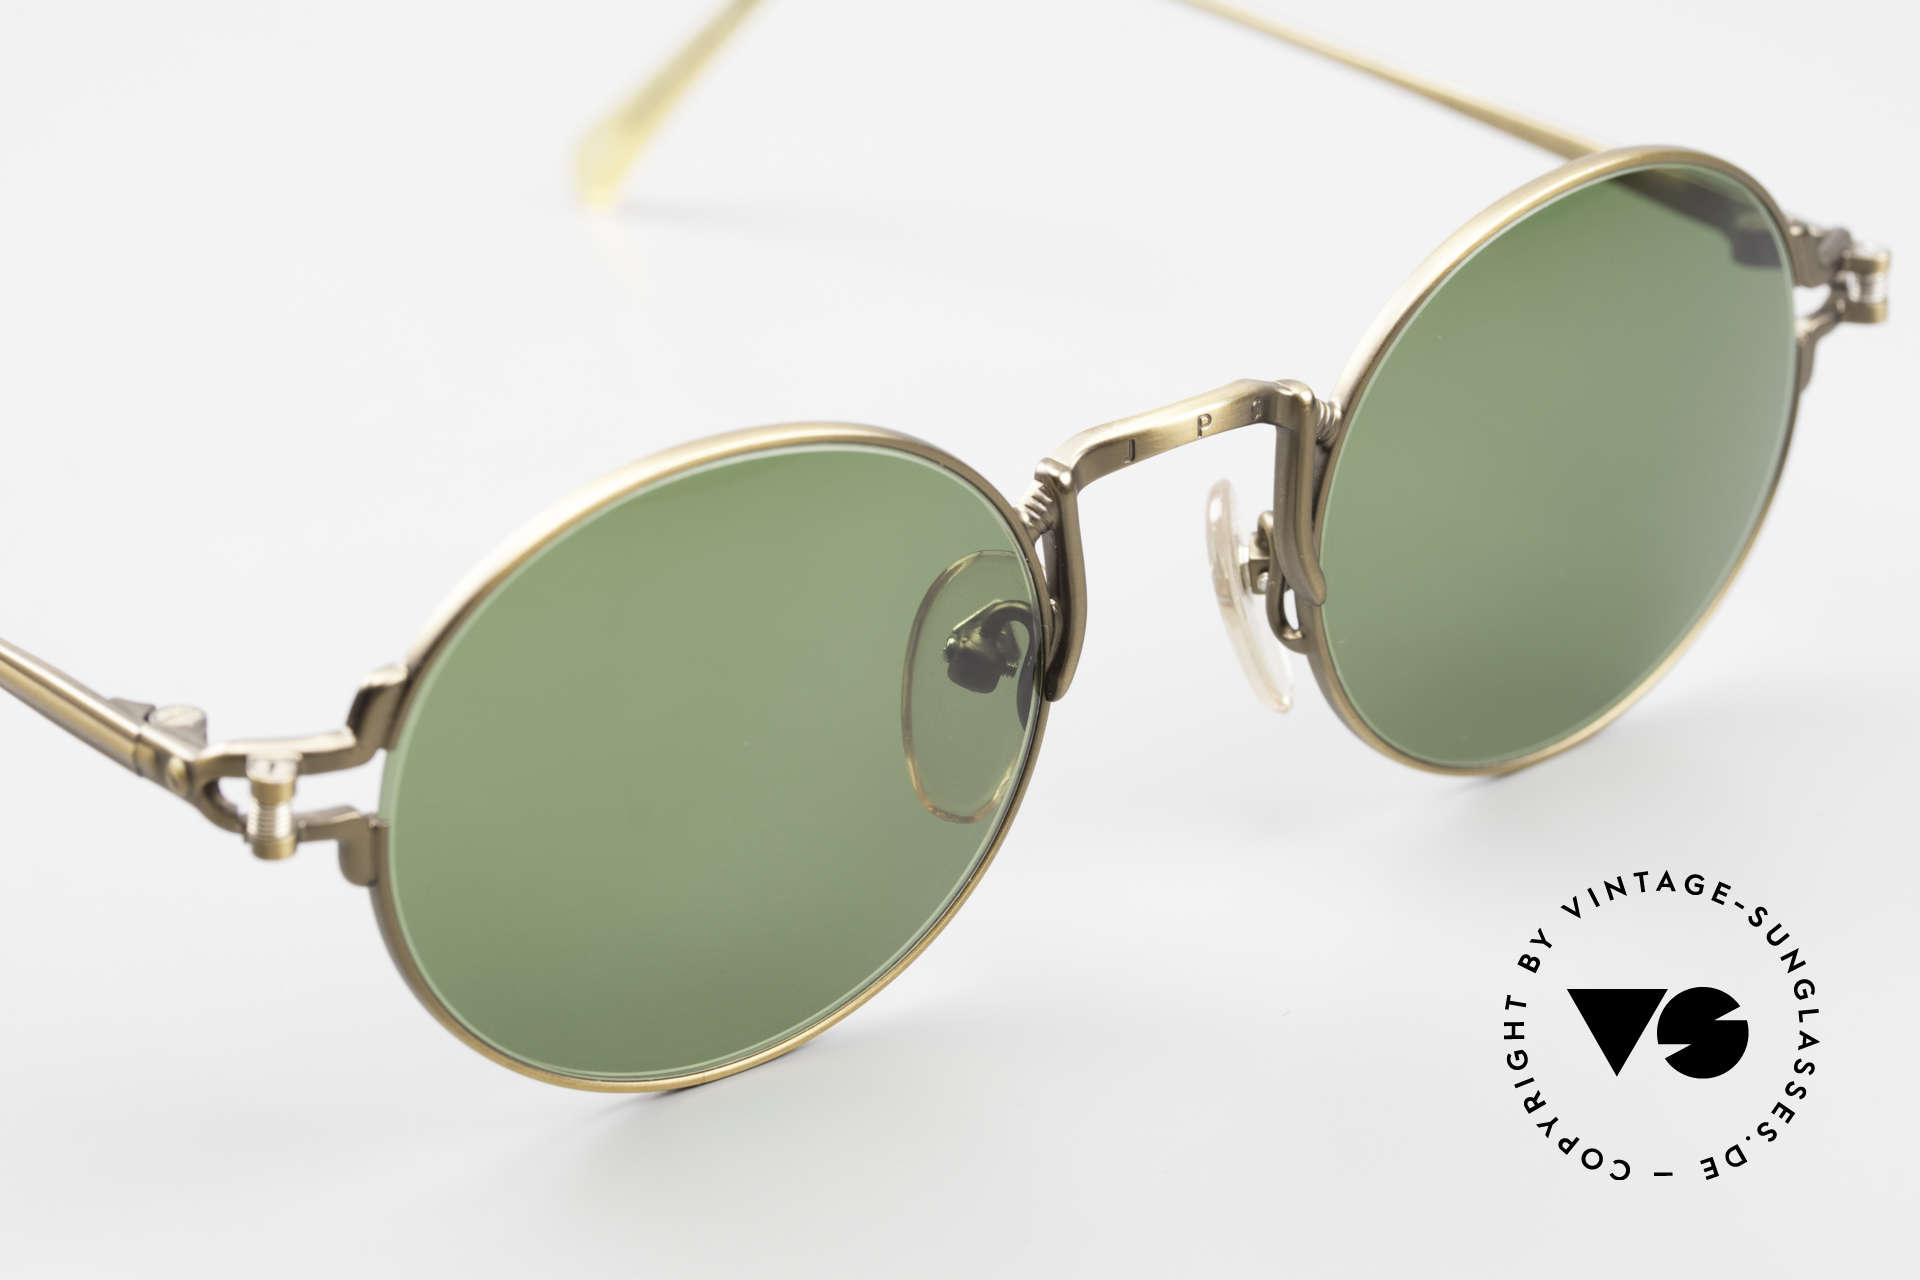 Jean Paul Gaultier 55-3171 Round 90's JPG Sunglasses, NO retro eyewear; a rare ORIGINAL with green lenses, Made for Men and Women